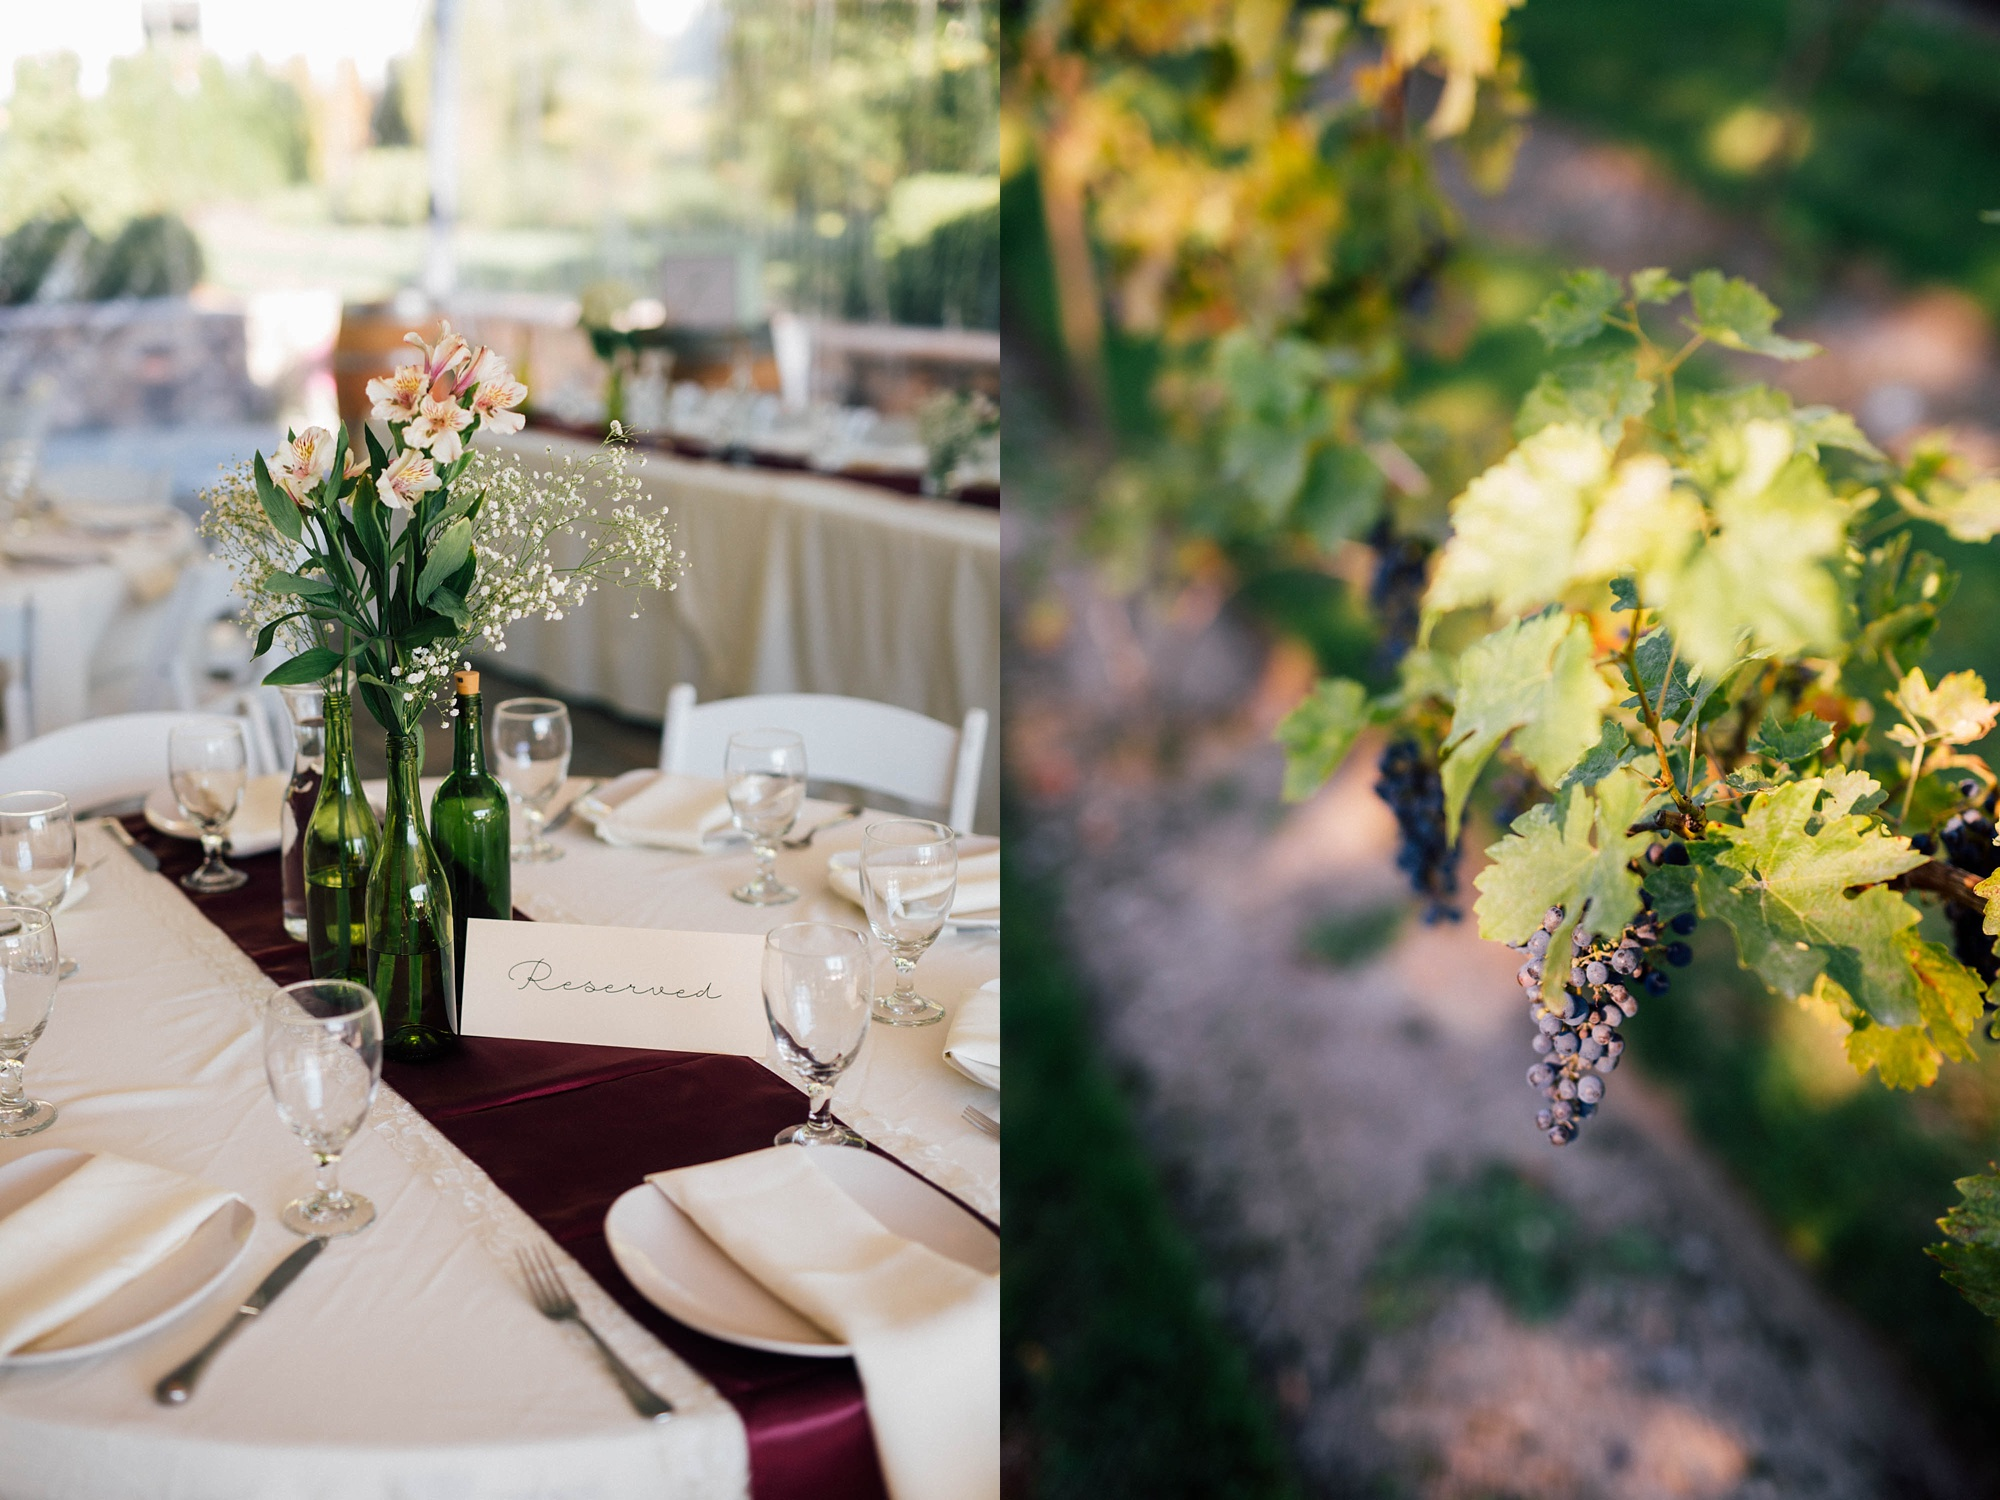 ashley_vos_seattle_ wedding_photographer_0183.jpg